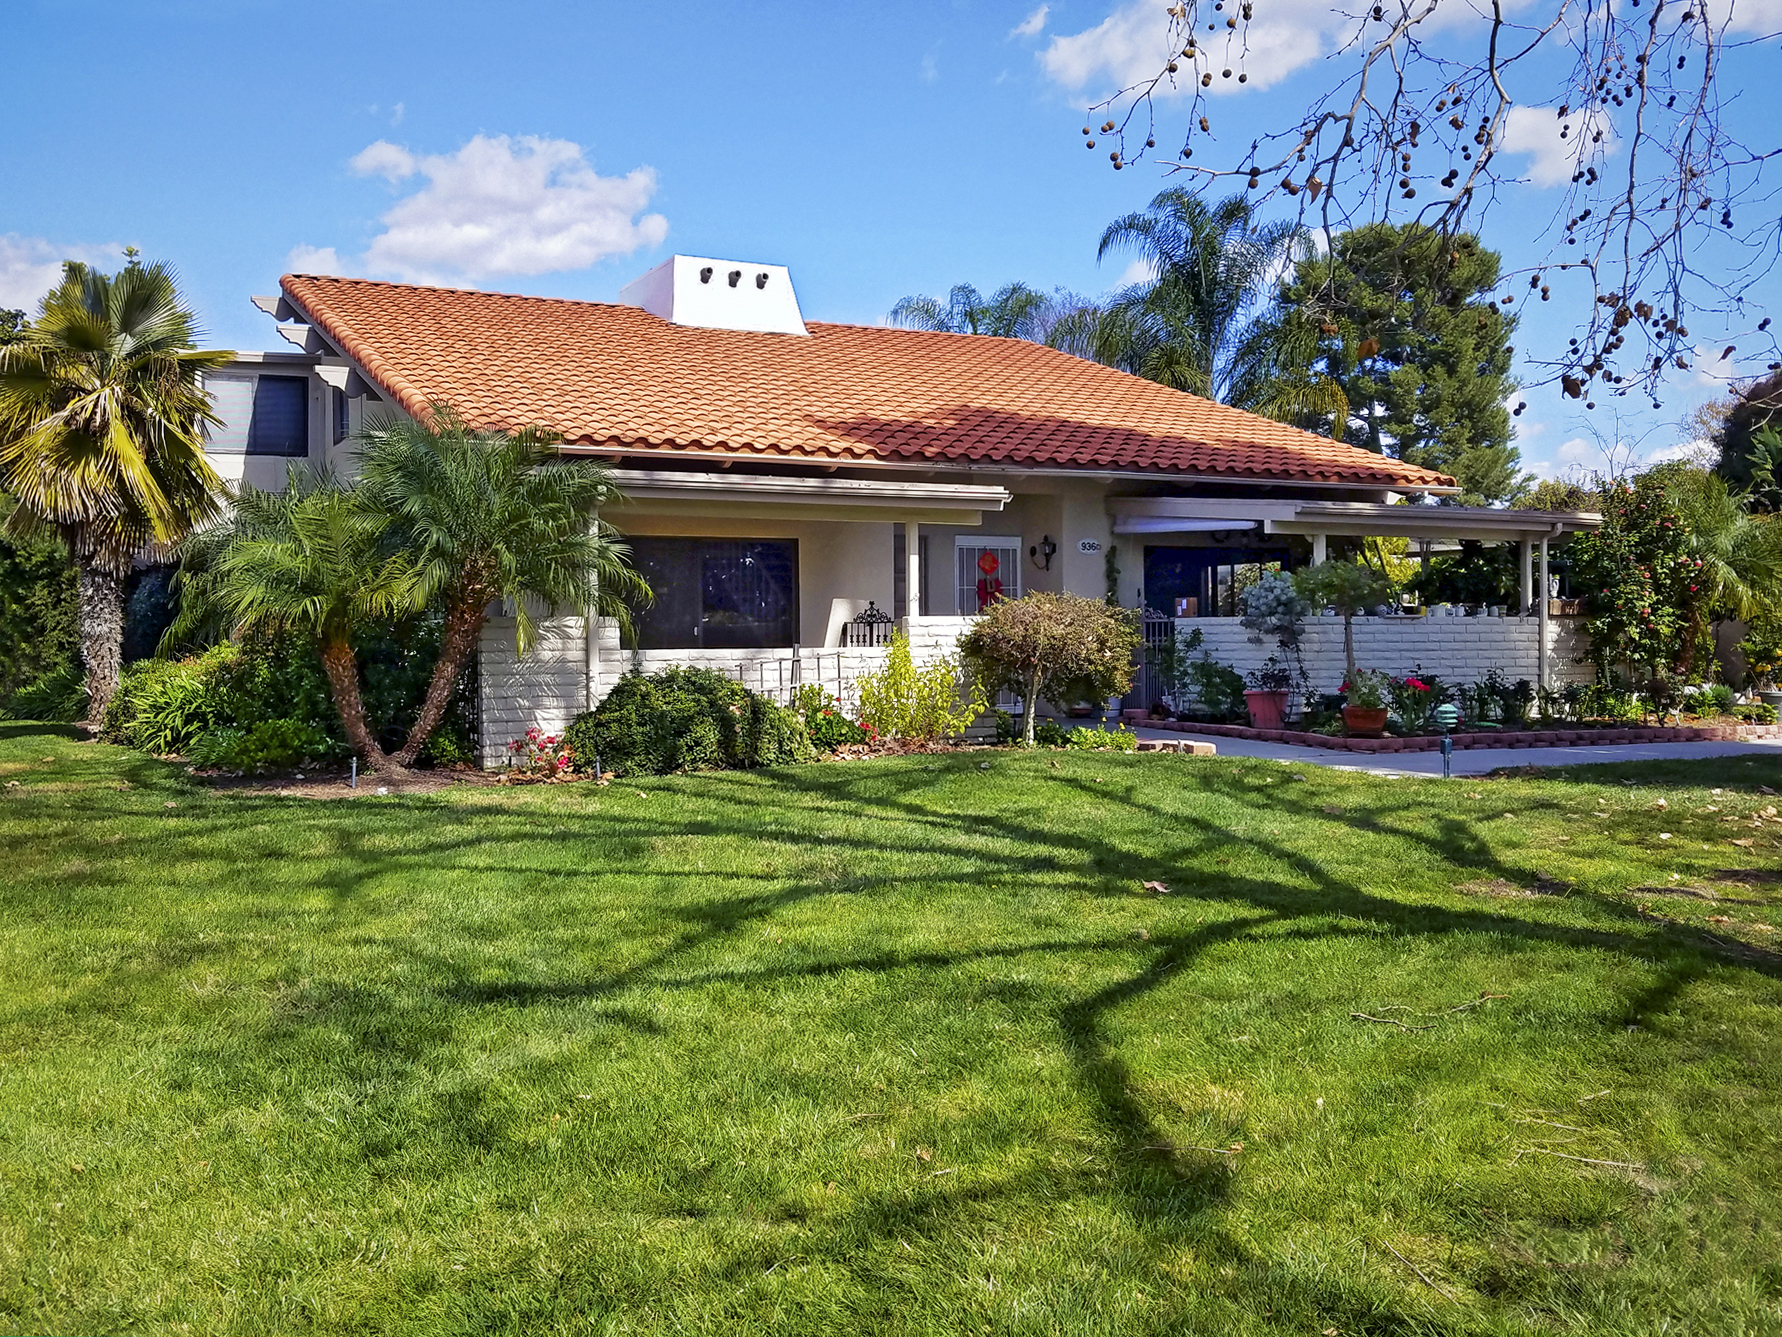 Laguna Woods Homes For Sale Laguna Woods Real Estate Ca